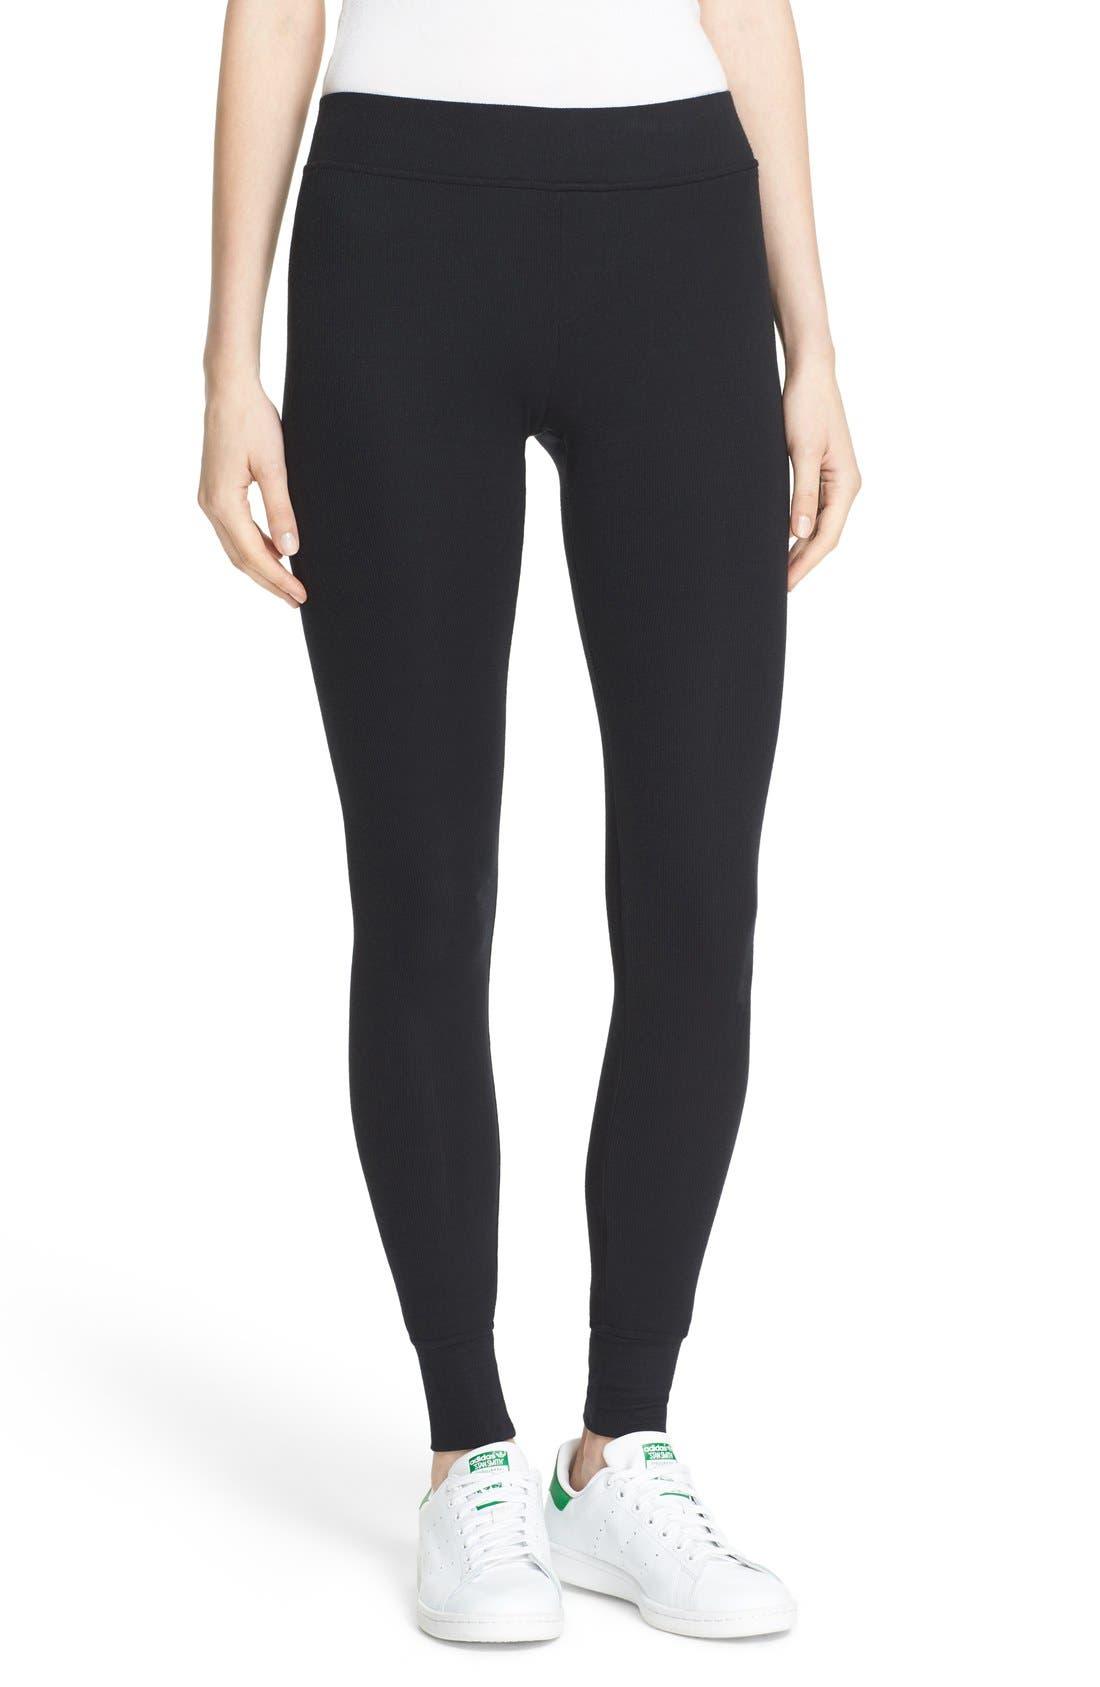 Rib Knit Yoga Leggings,                         Main,                         color, BLACK